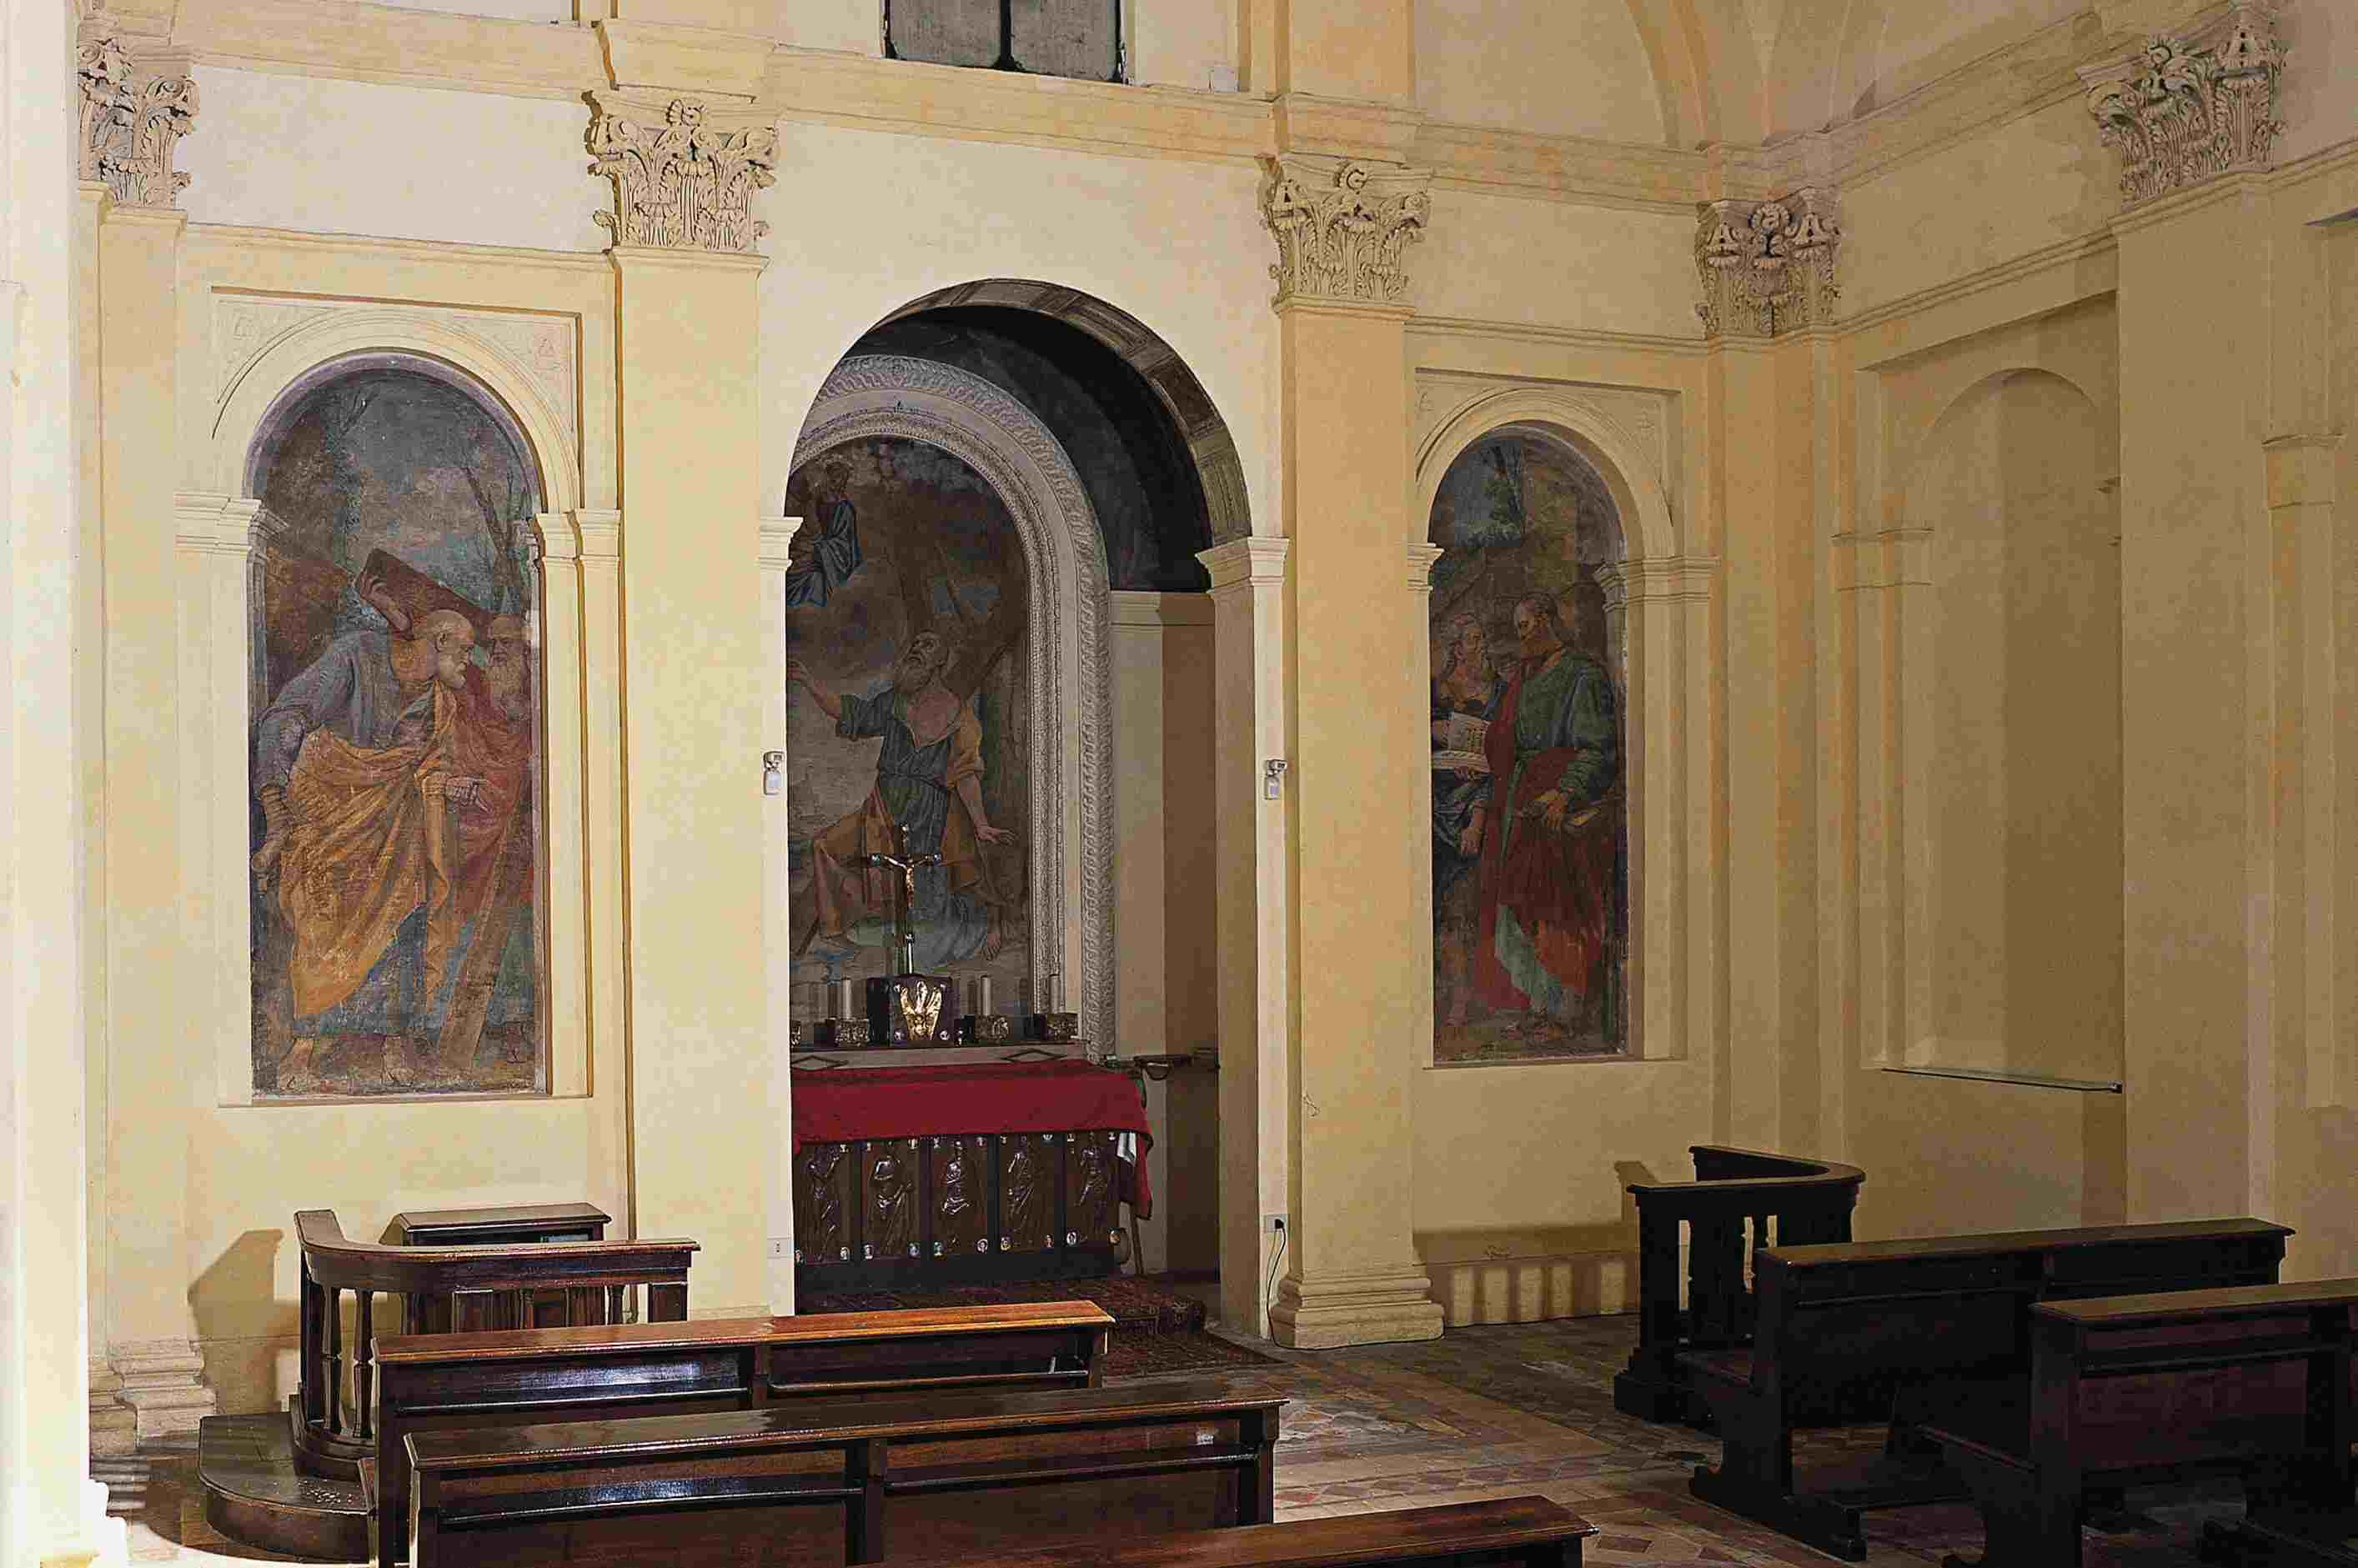 interior Corinthian pilasters surround apse of small chapel